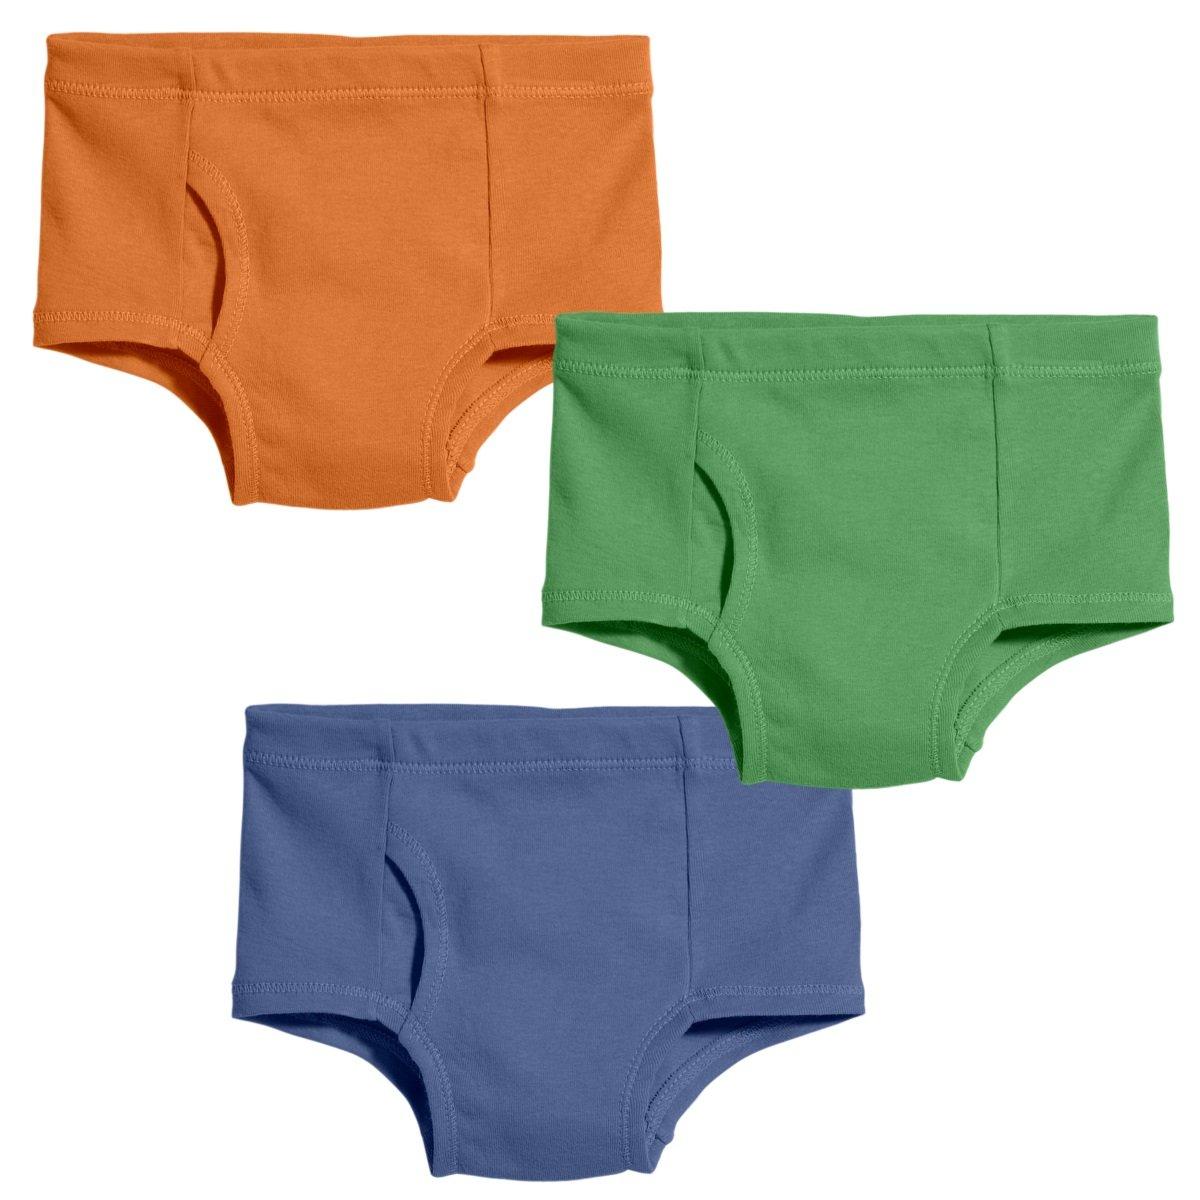 City Threads Boys Organic Cotton Brief Underwear For Sensitive Skin and Sensory Friendly (SPD), Boy, 4